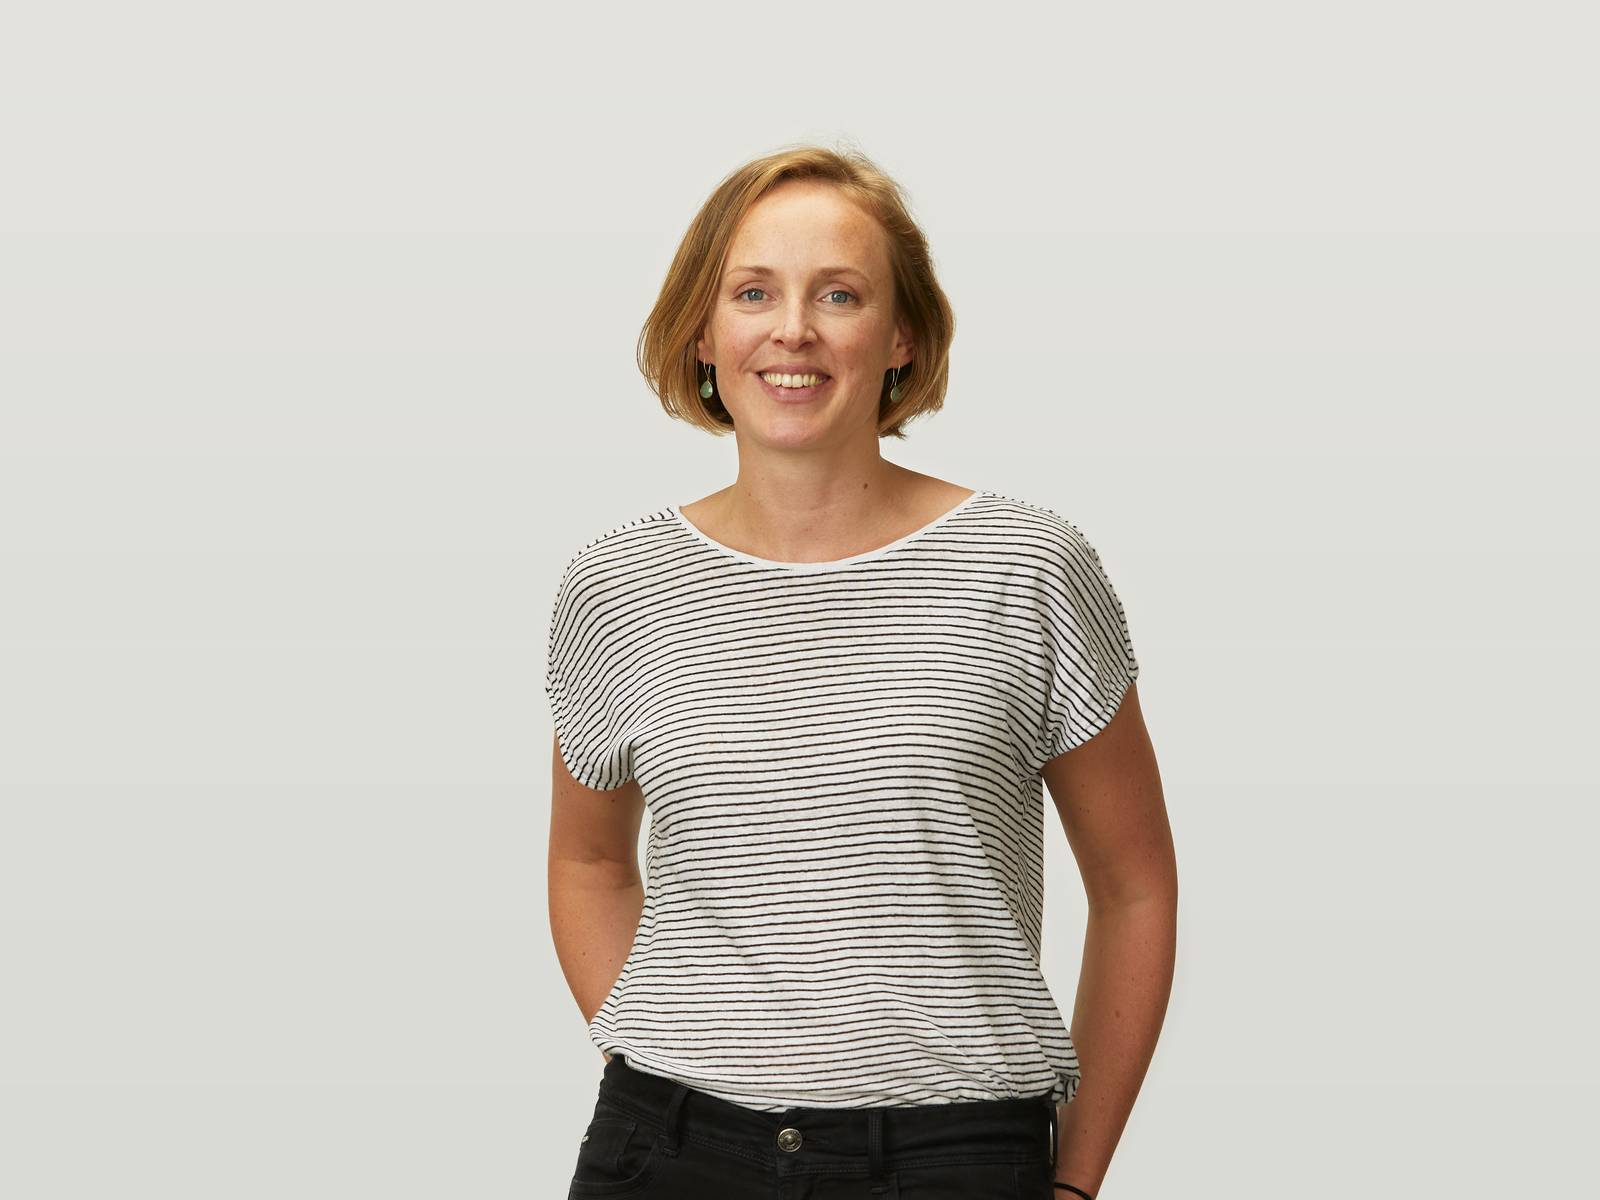 A profile image of Fran Evans